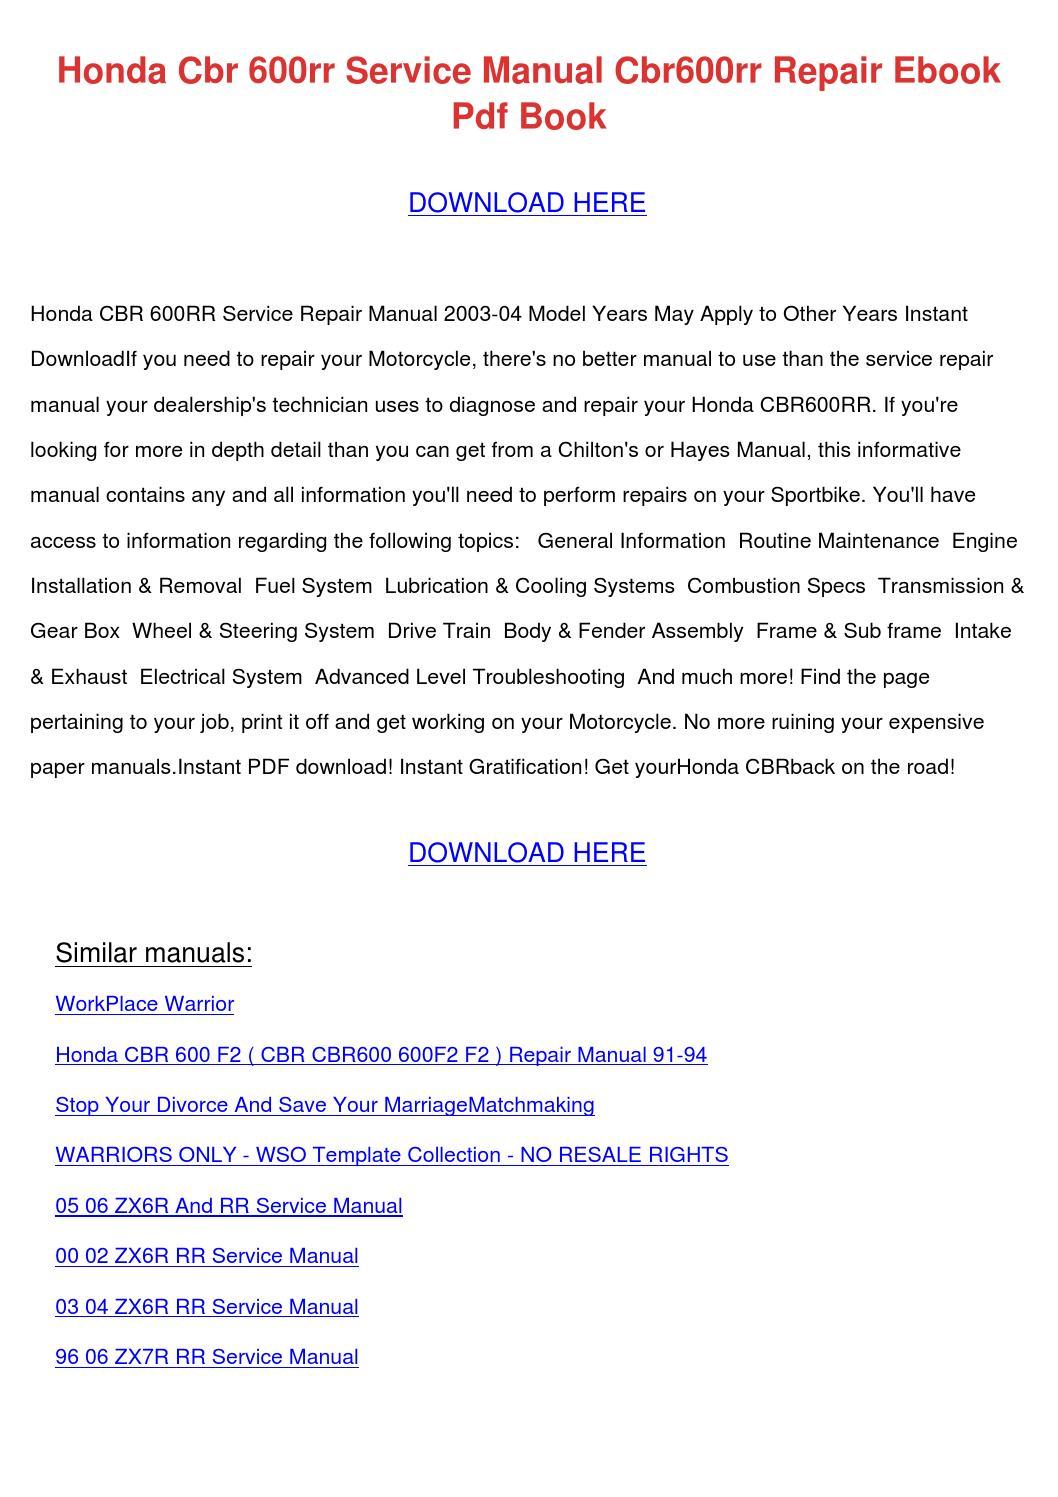 honda cbr600rr service manual pdf